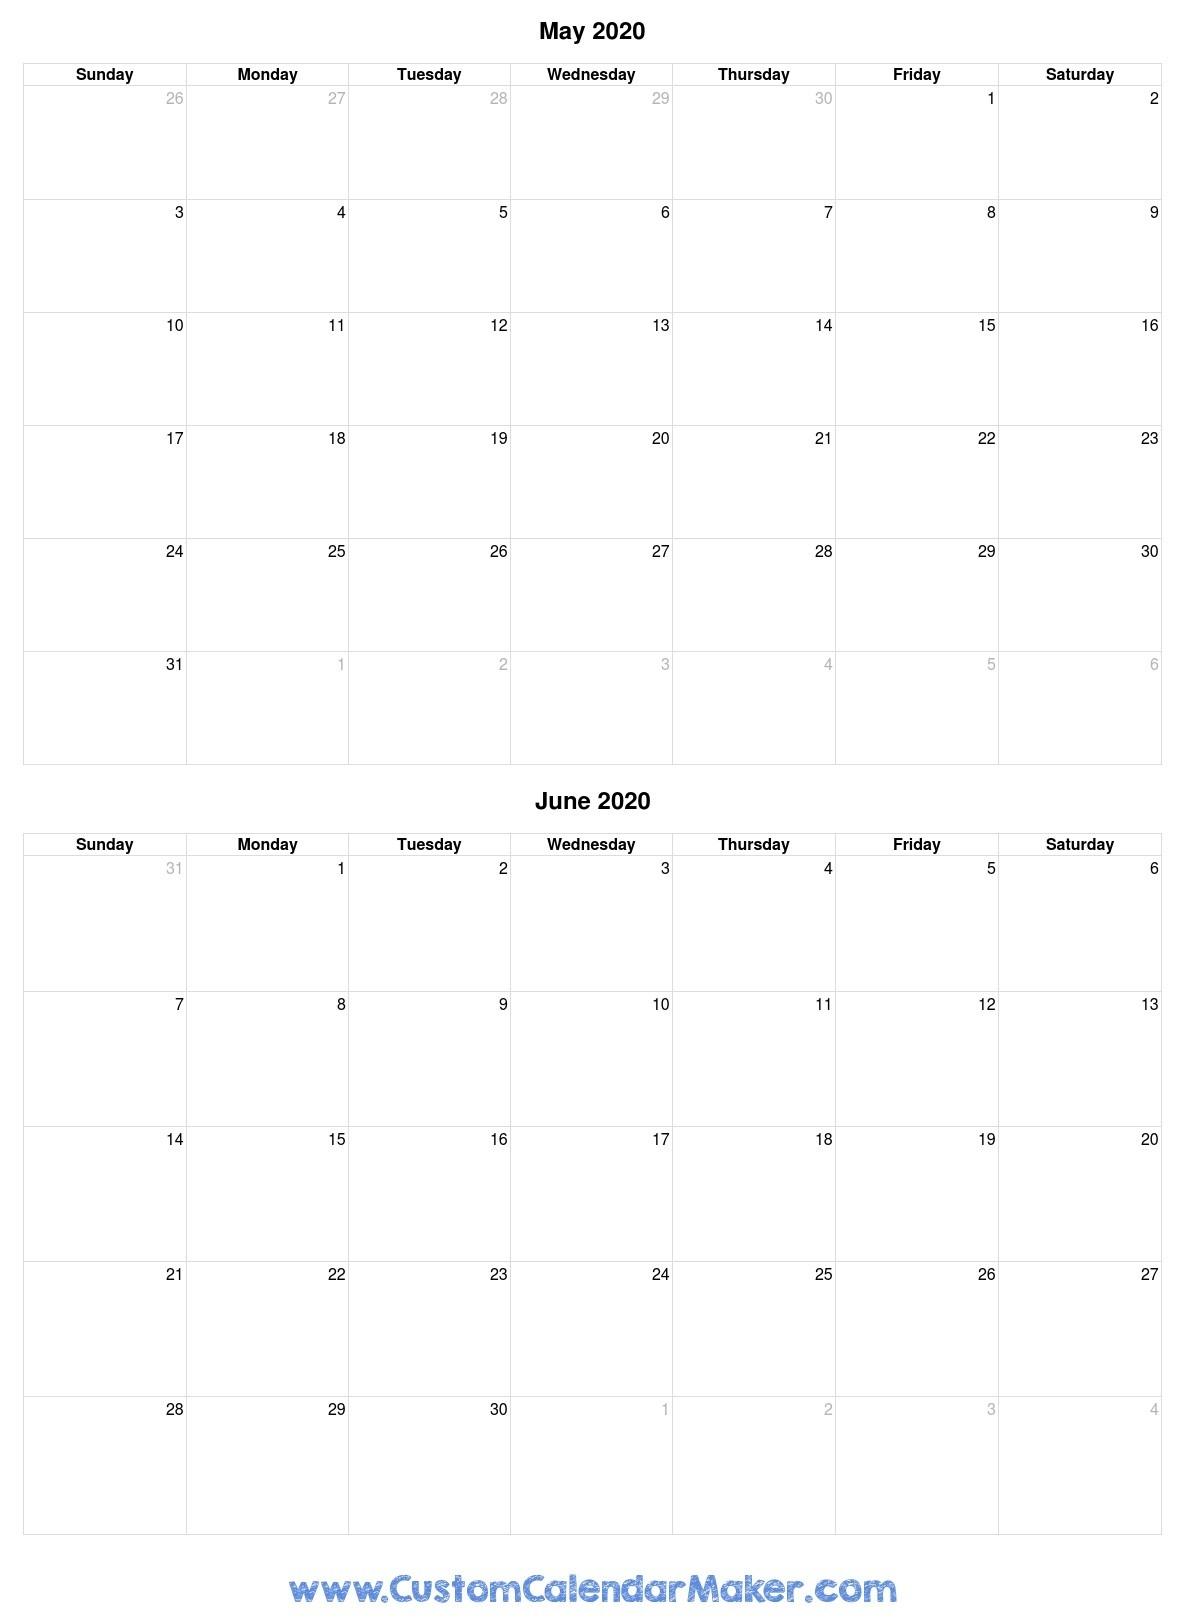 May And June 2020 Free Printable Calendar Template  2020 Calendar Template